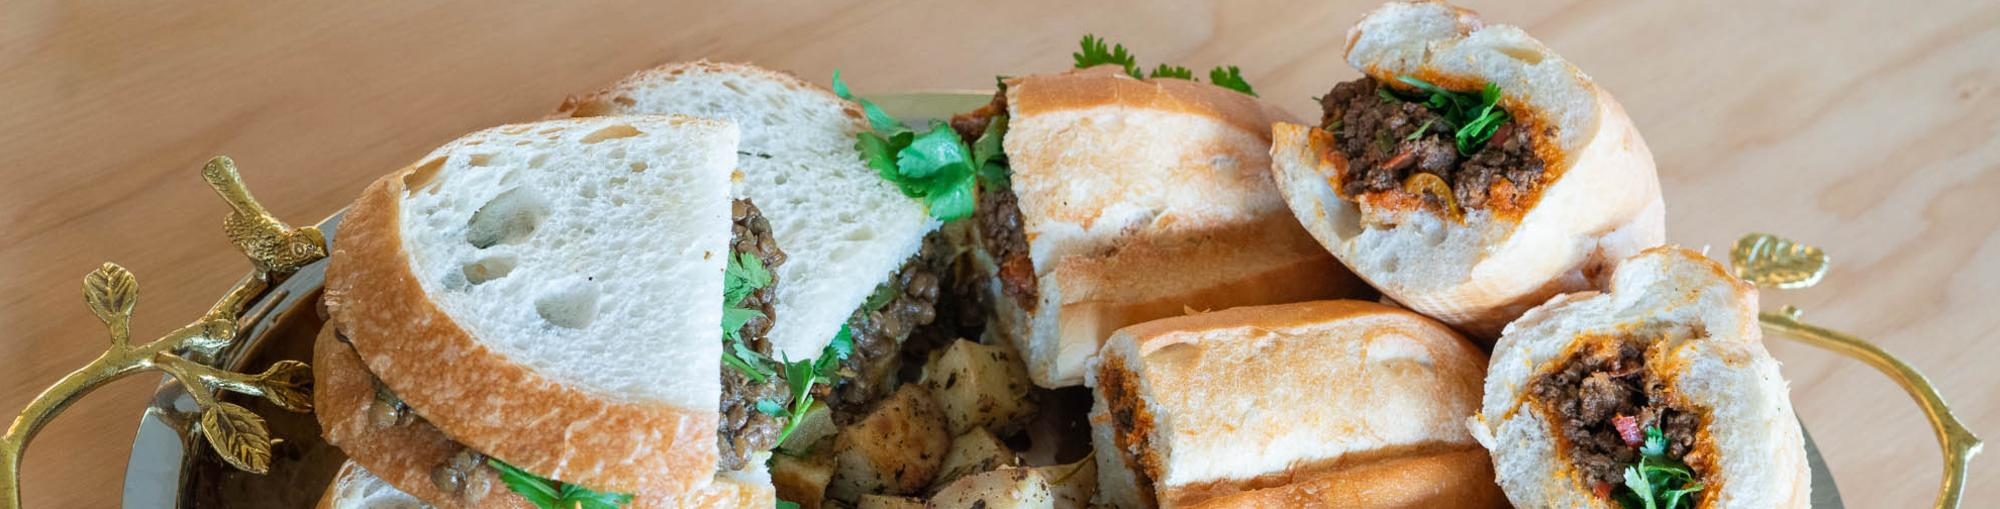 Sandwiches from Spice Bridge International Food Hall